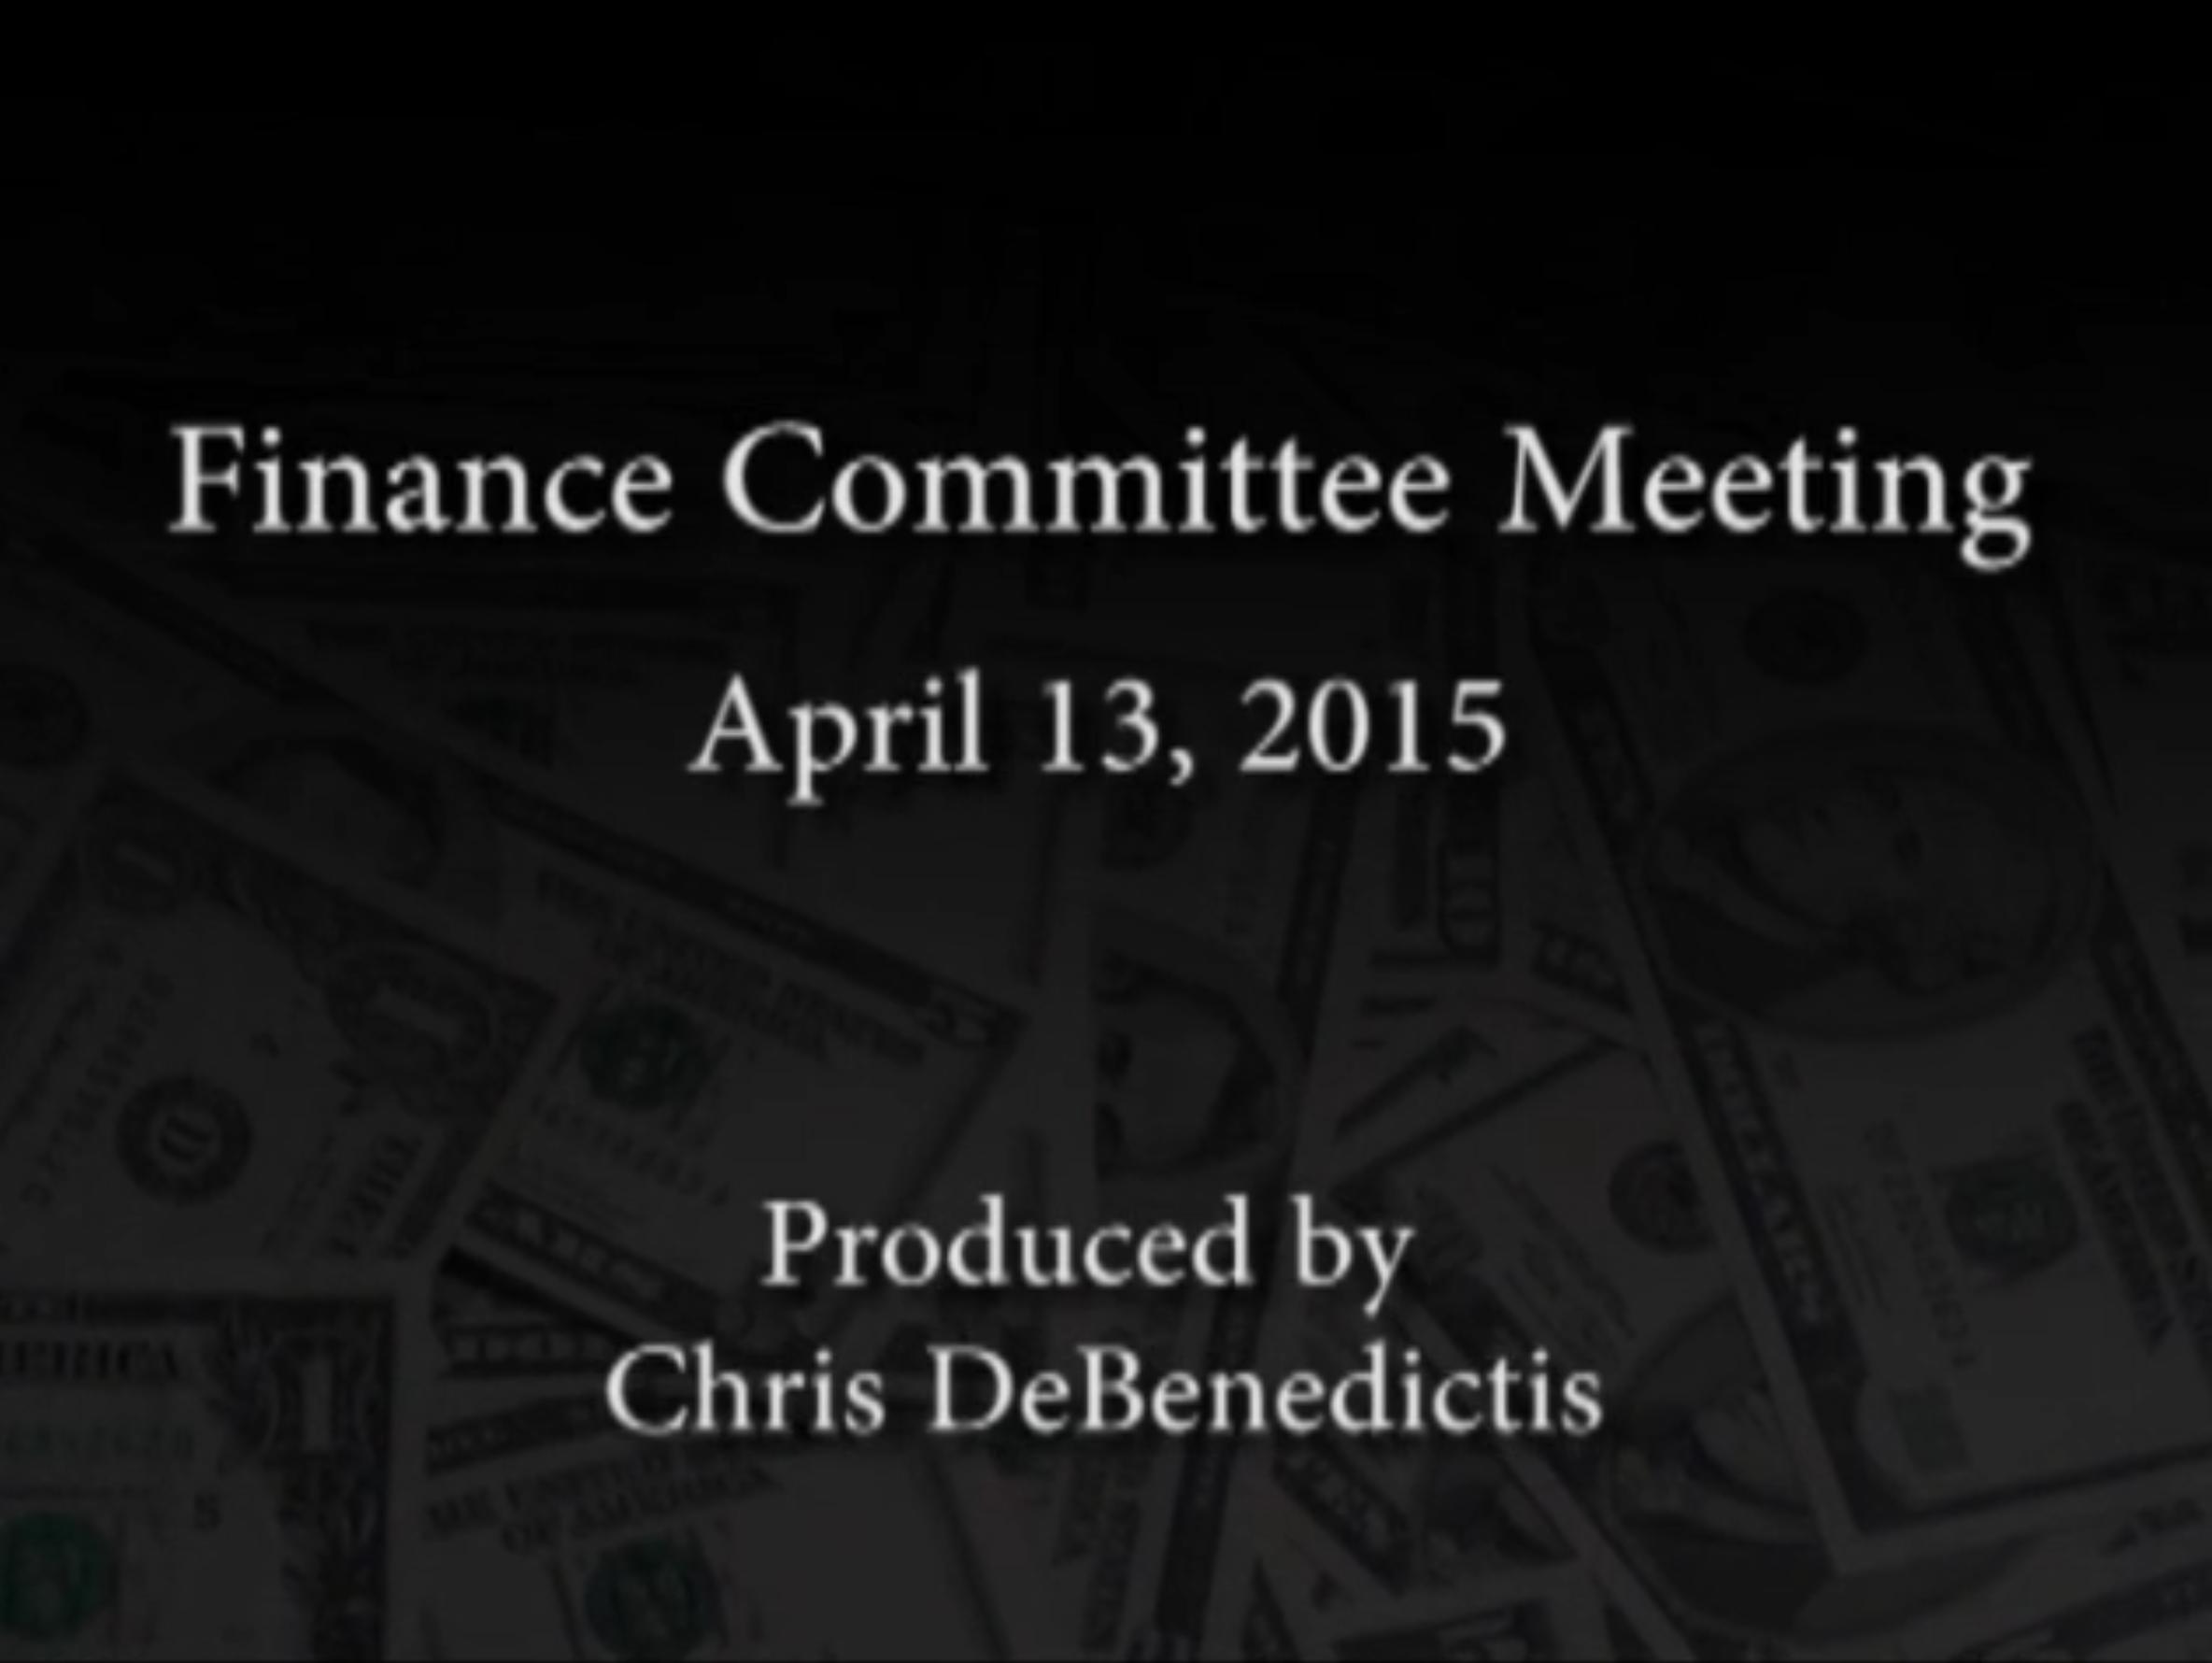 Finance Committee Meeting – April 13, 2015